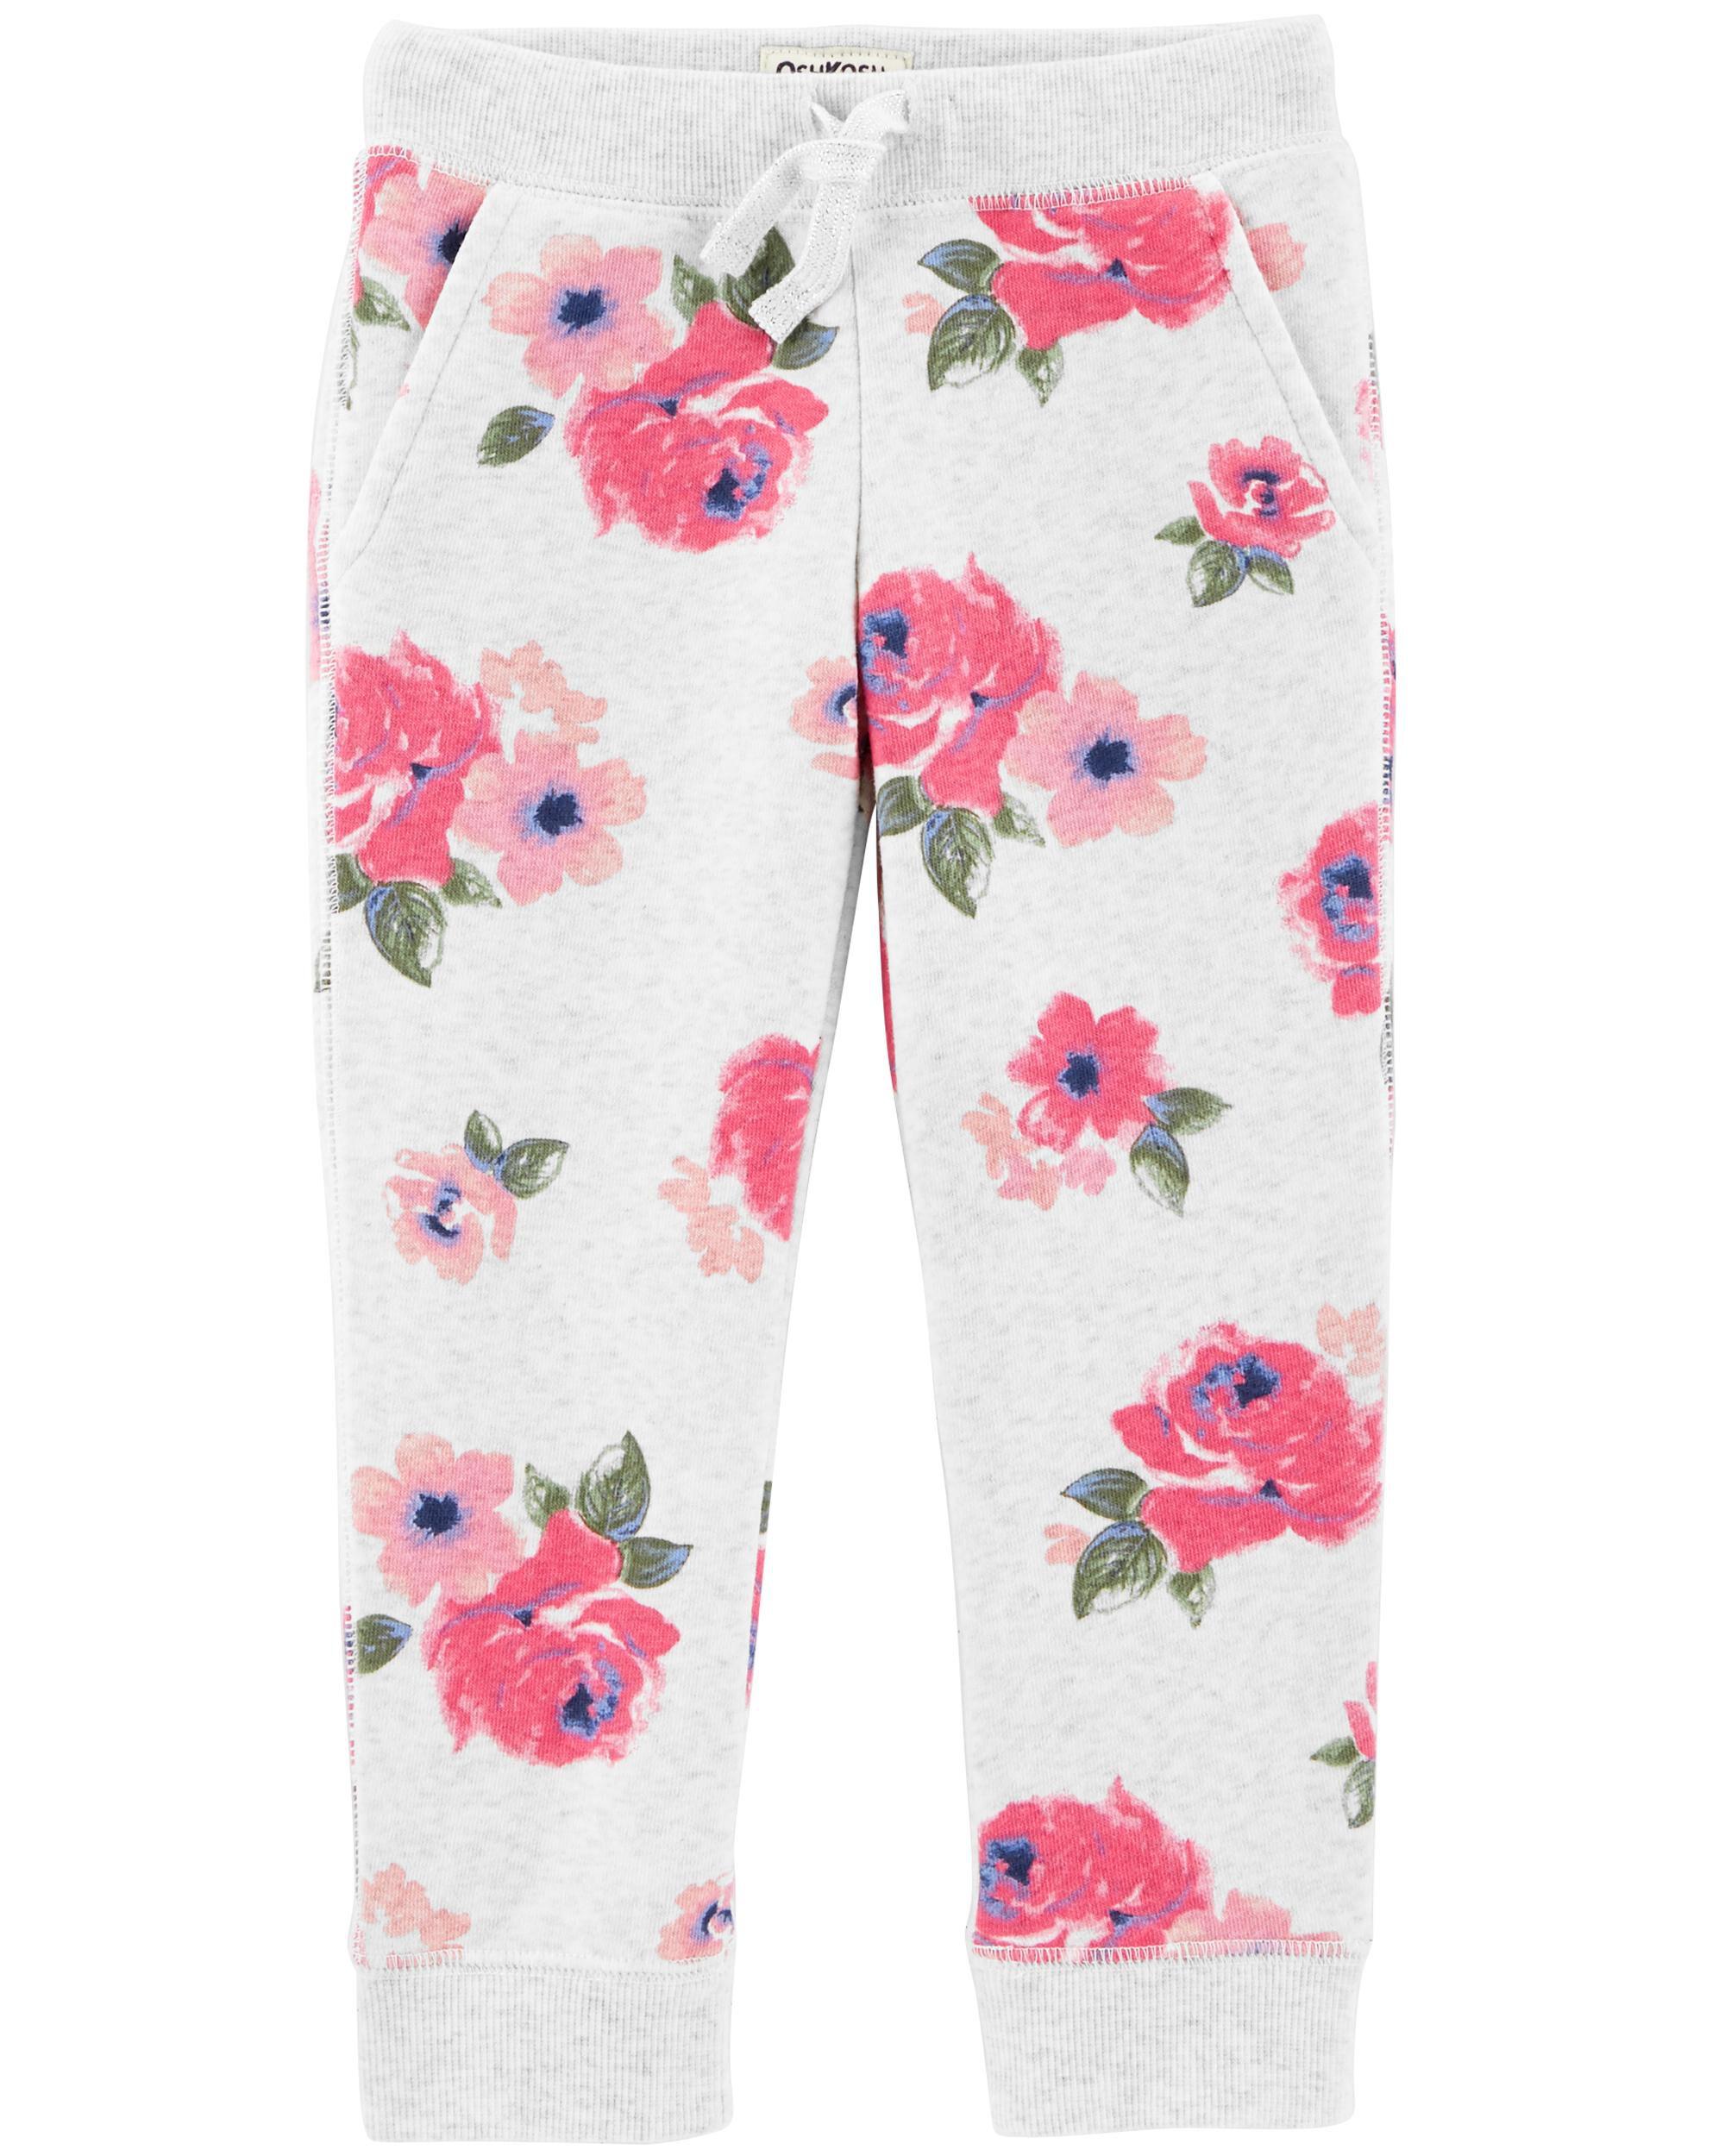 Floral Fleece Pants Oshkosh